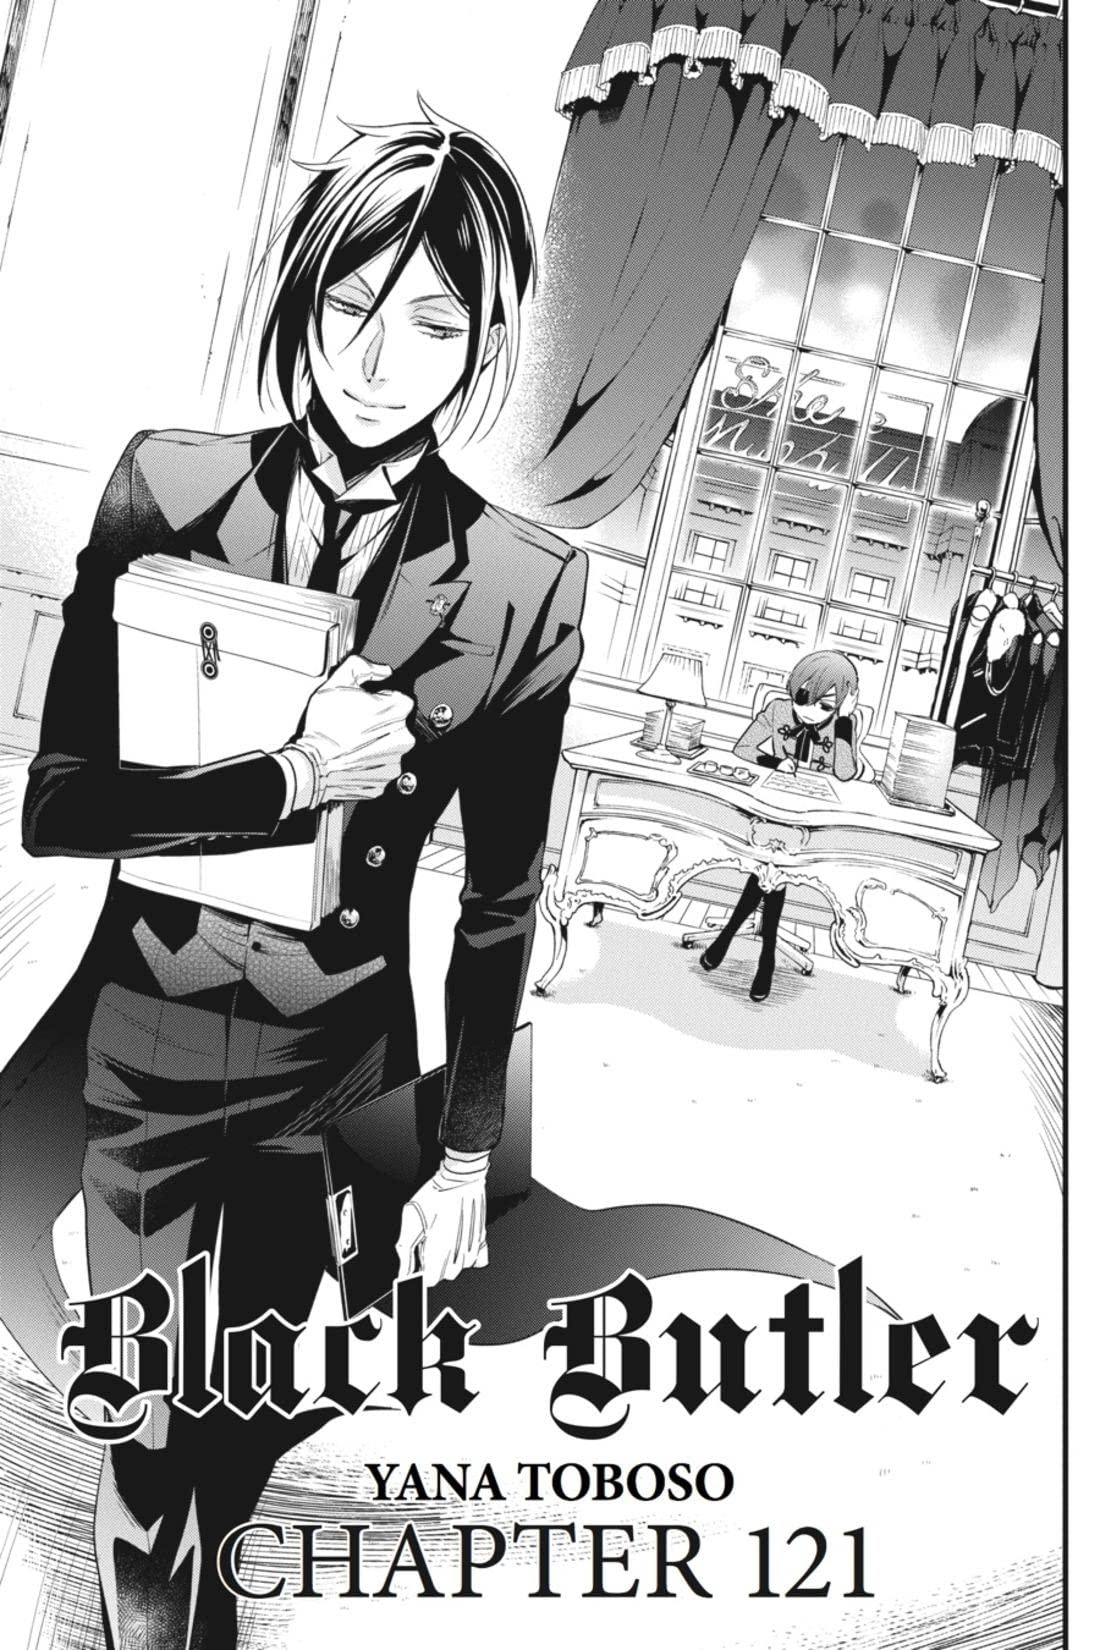 Black Butler #121